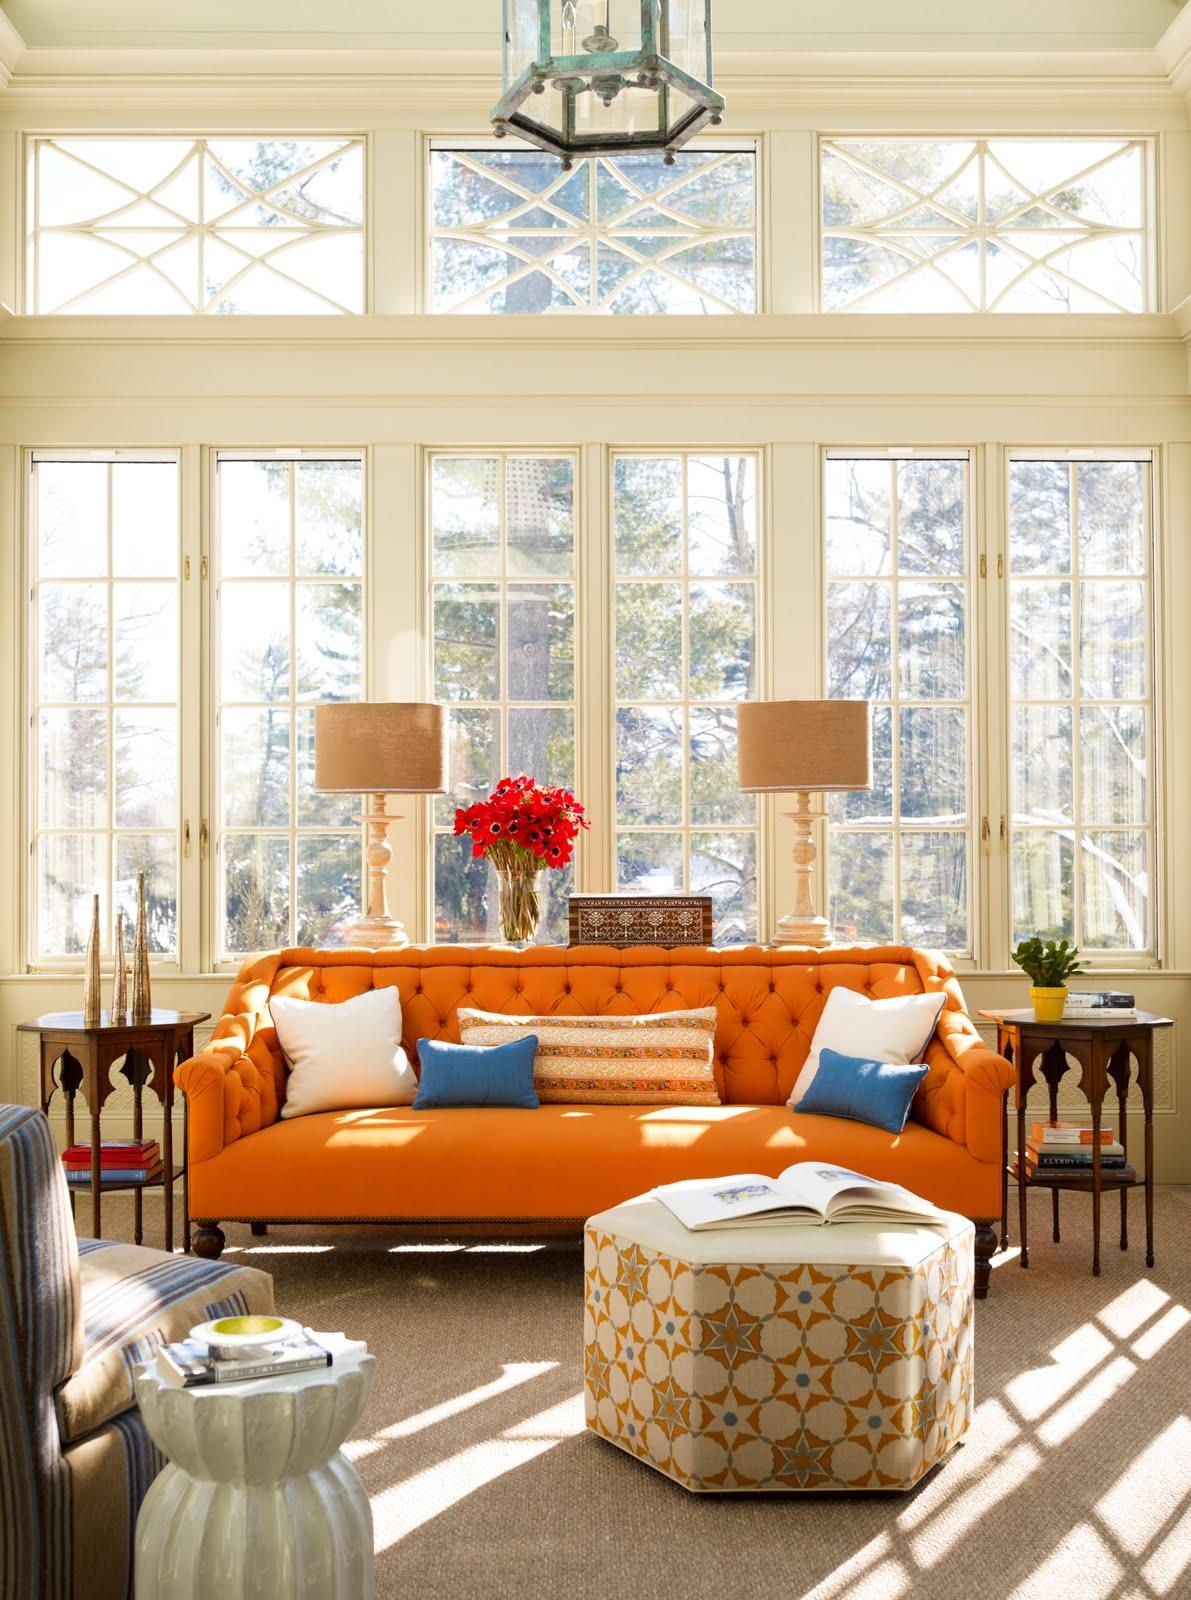 How To Adorn Your Interior With Orange Sofa | Homesfeed Regarding Orange Sofa Chairs (View 9 of 20)